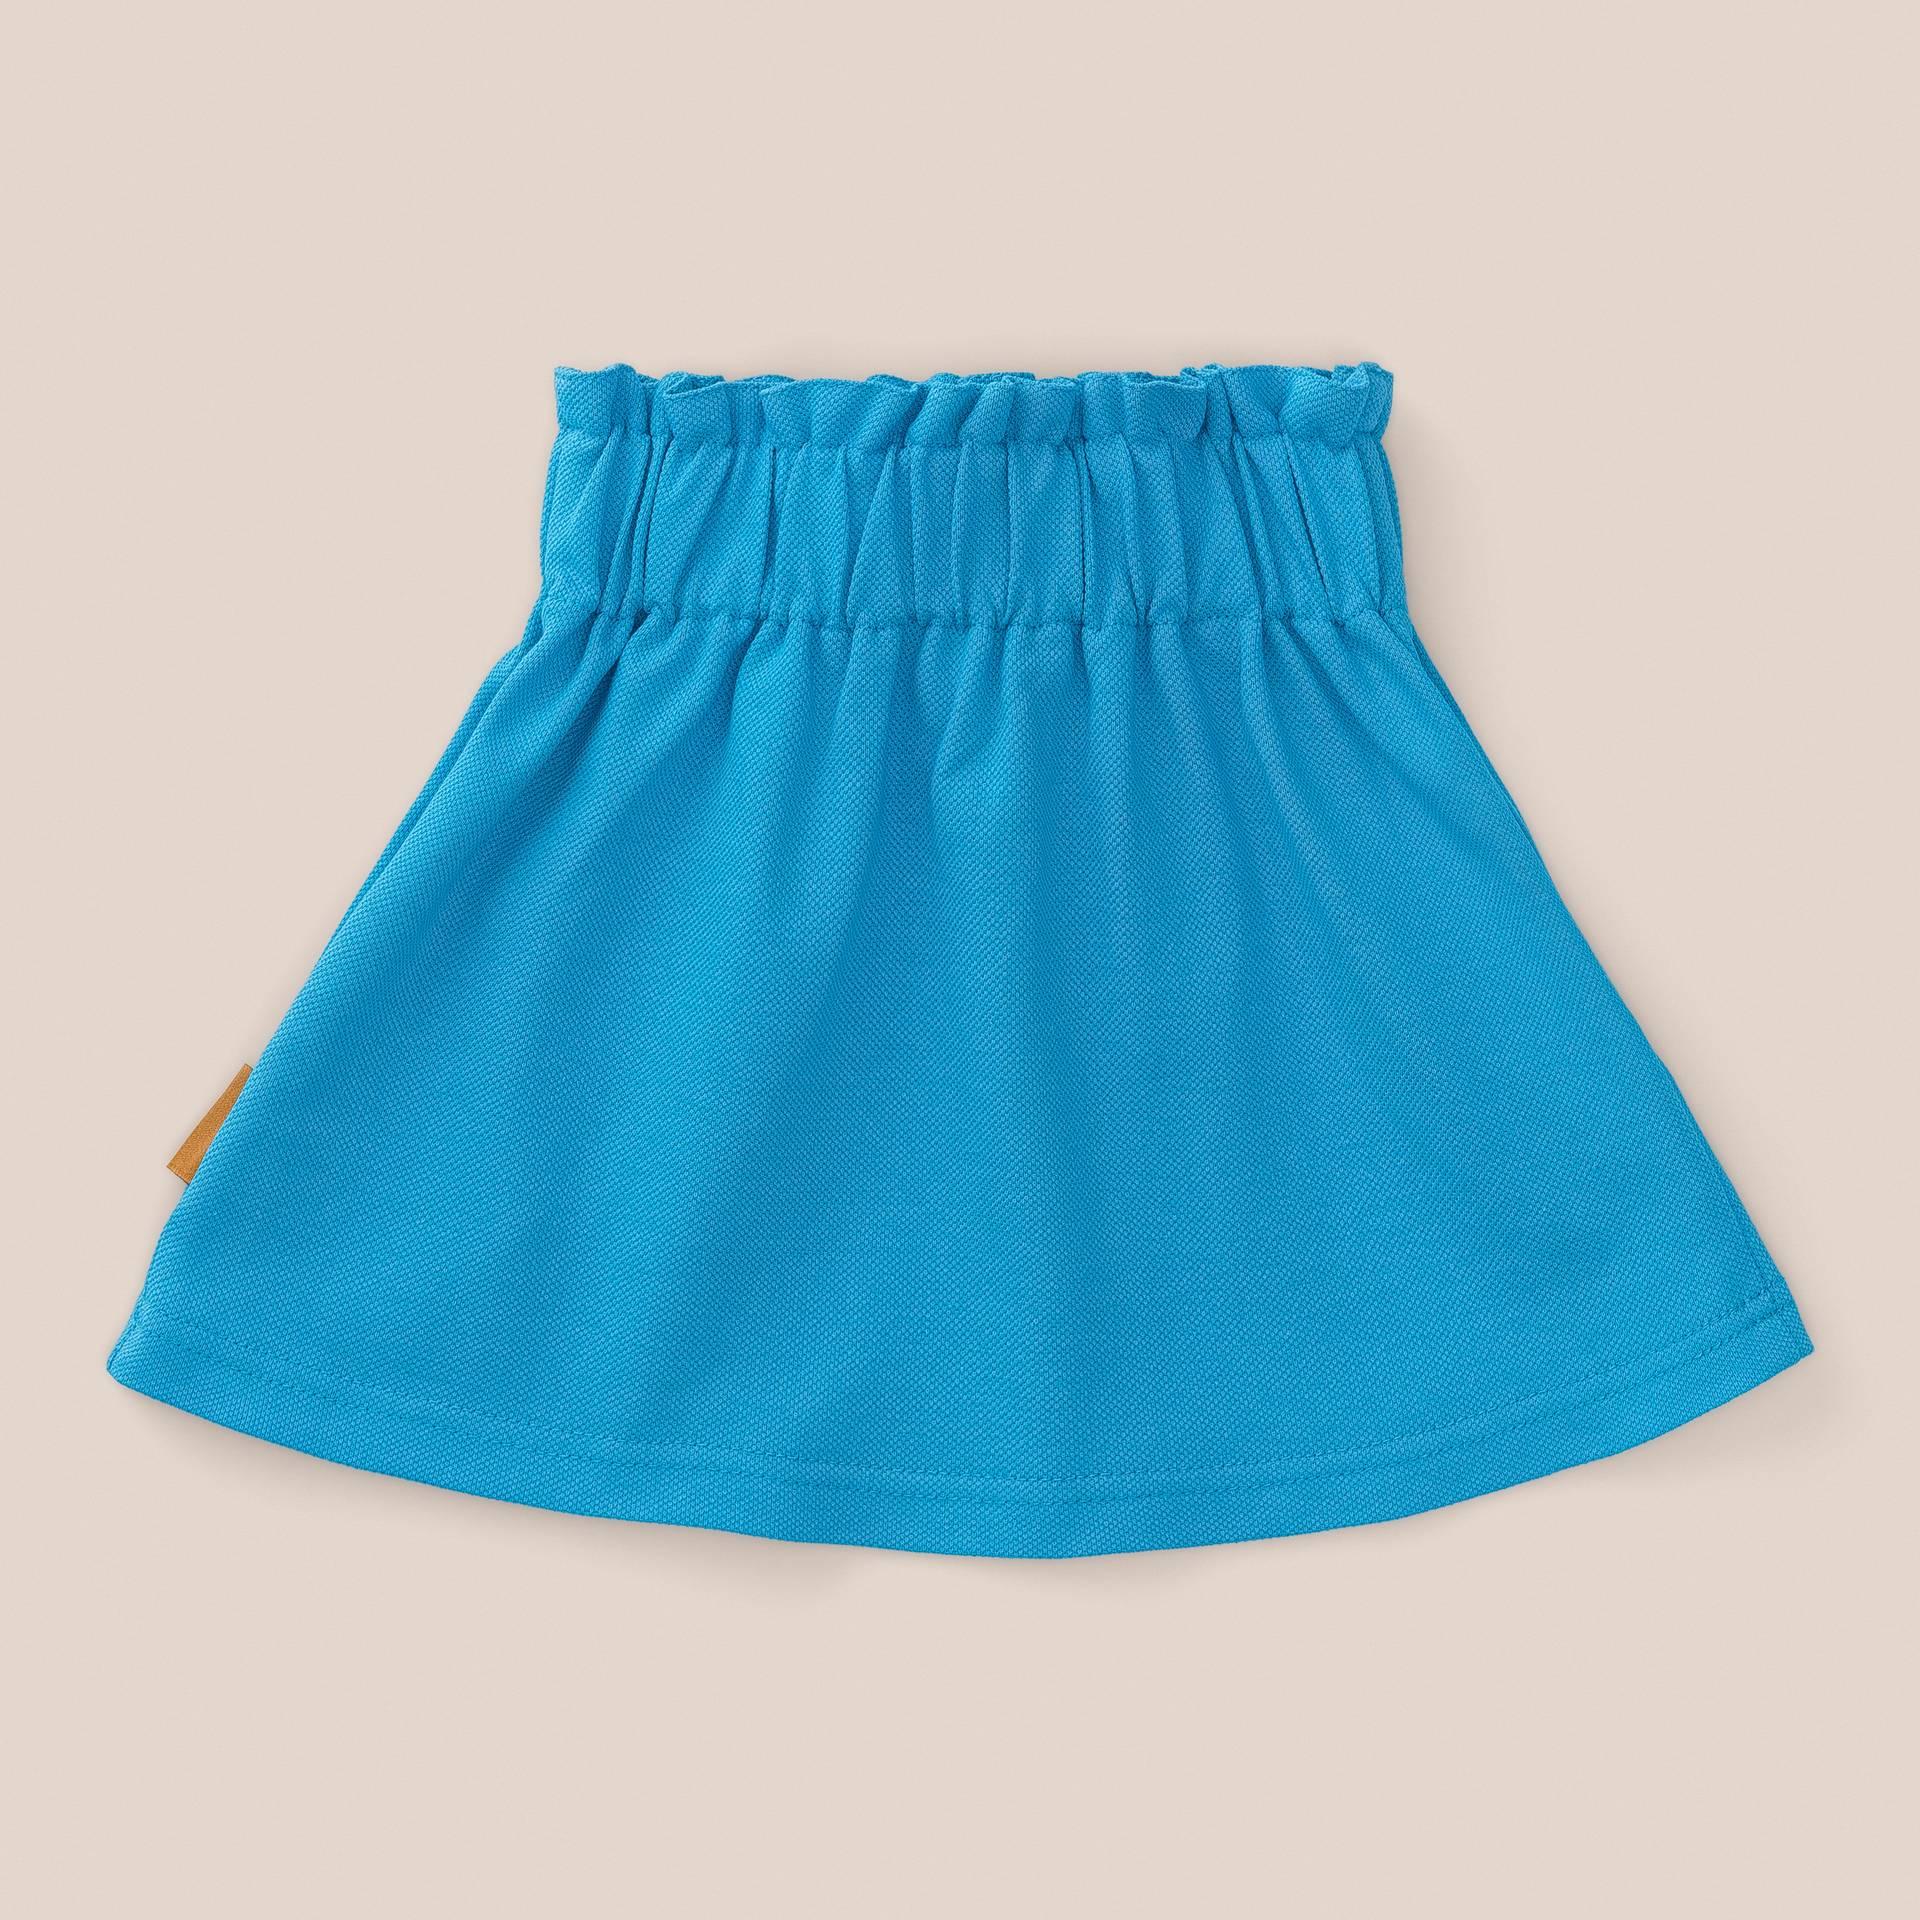 509001, Юбка для девочки с поясом от магазина Lemive